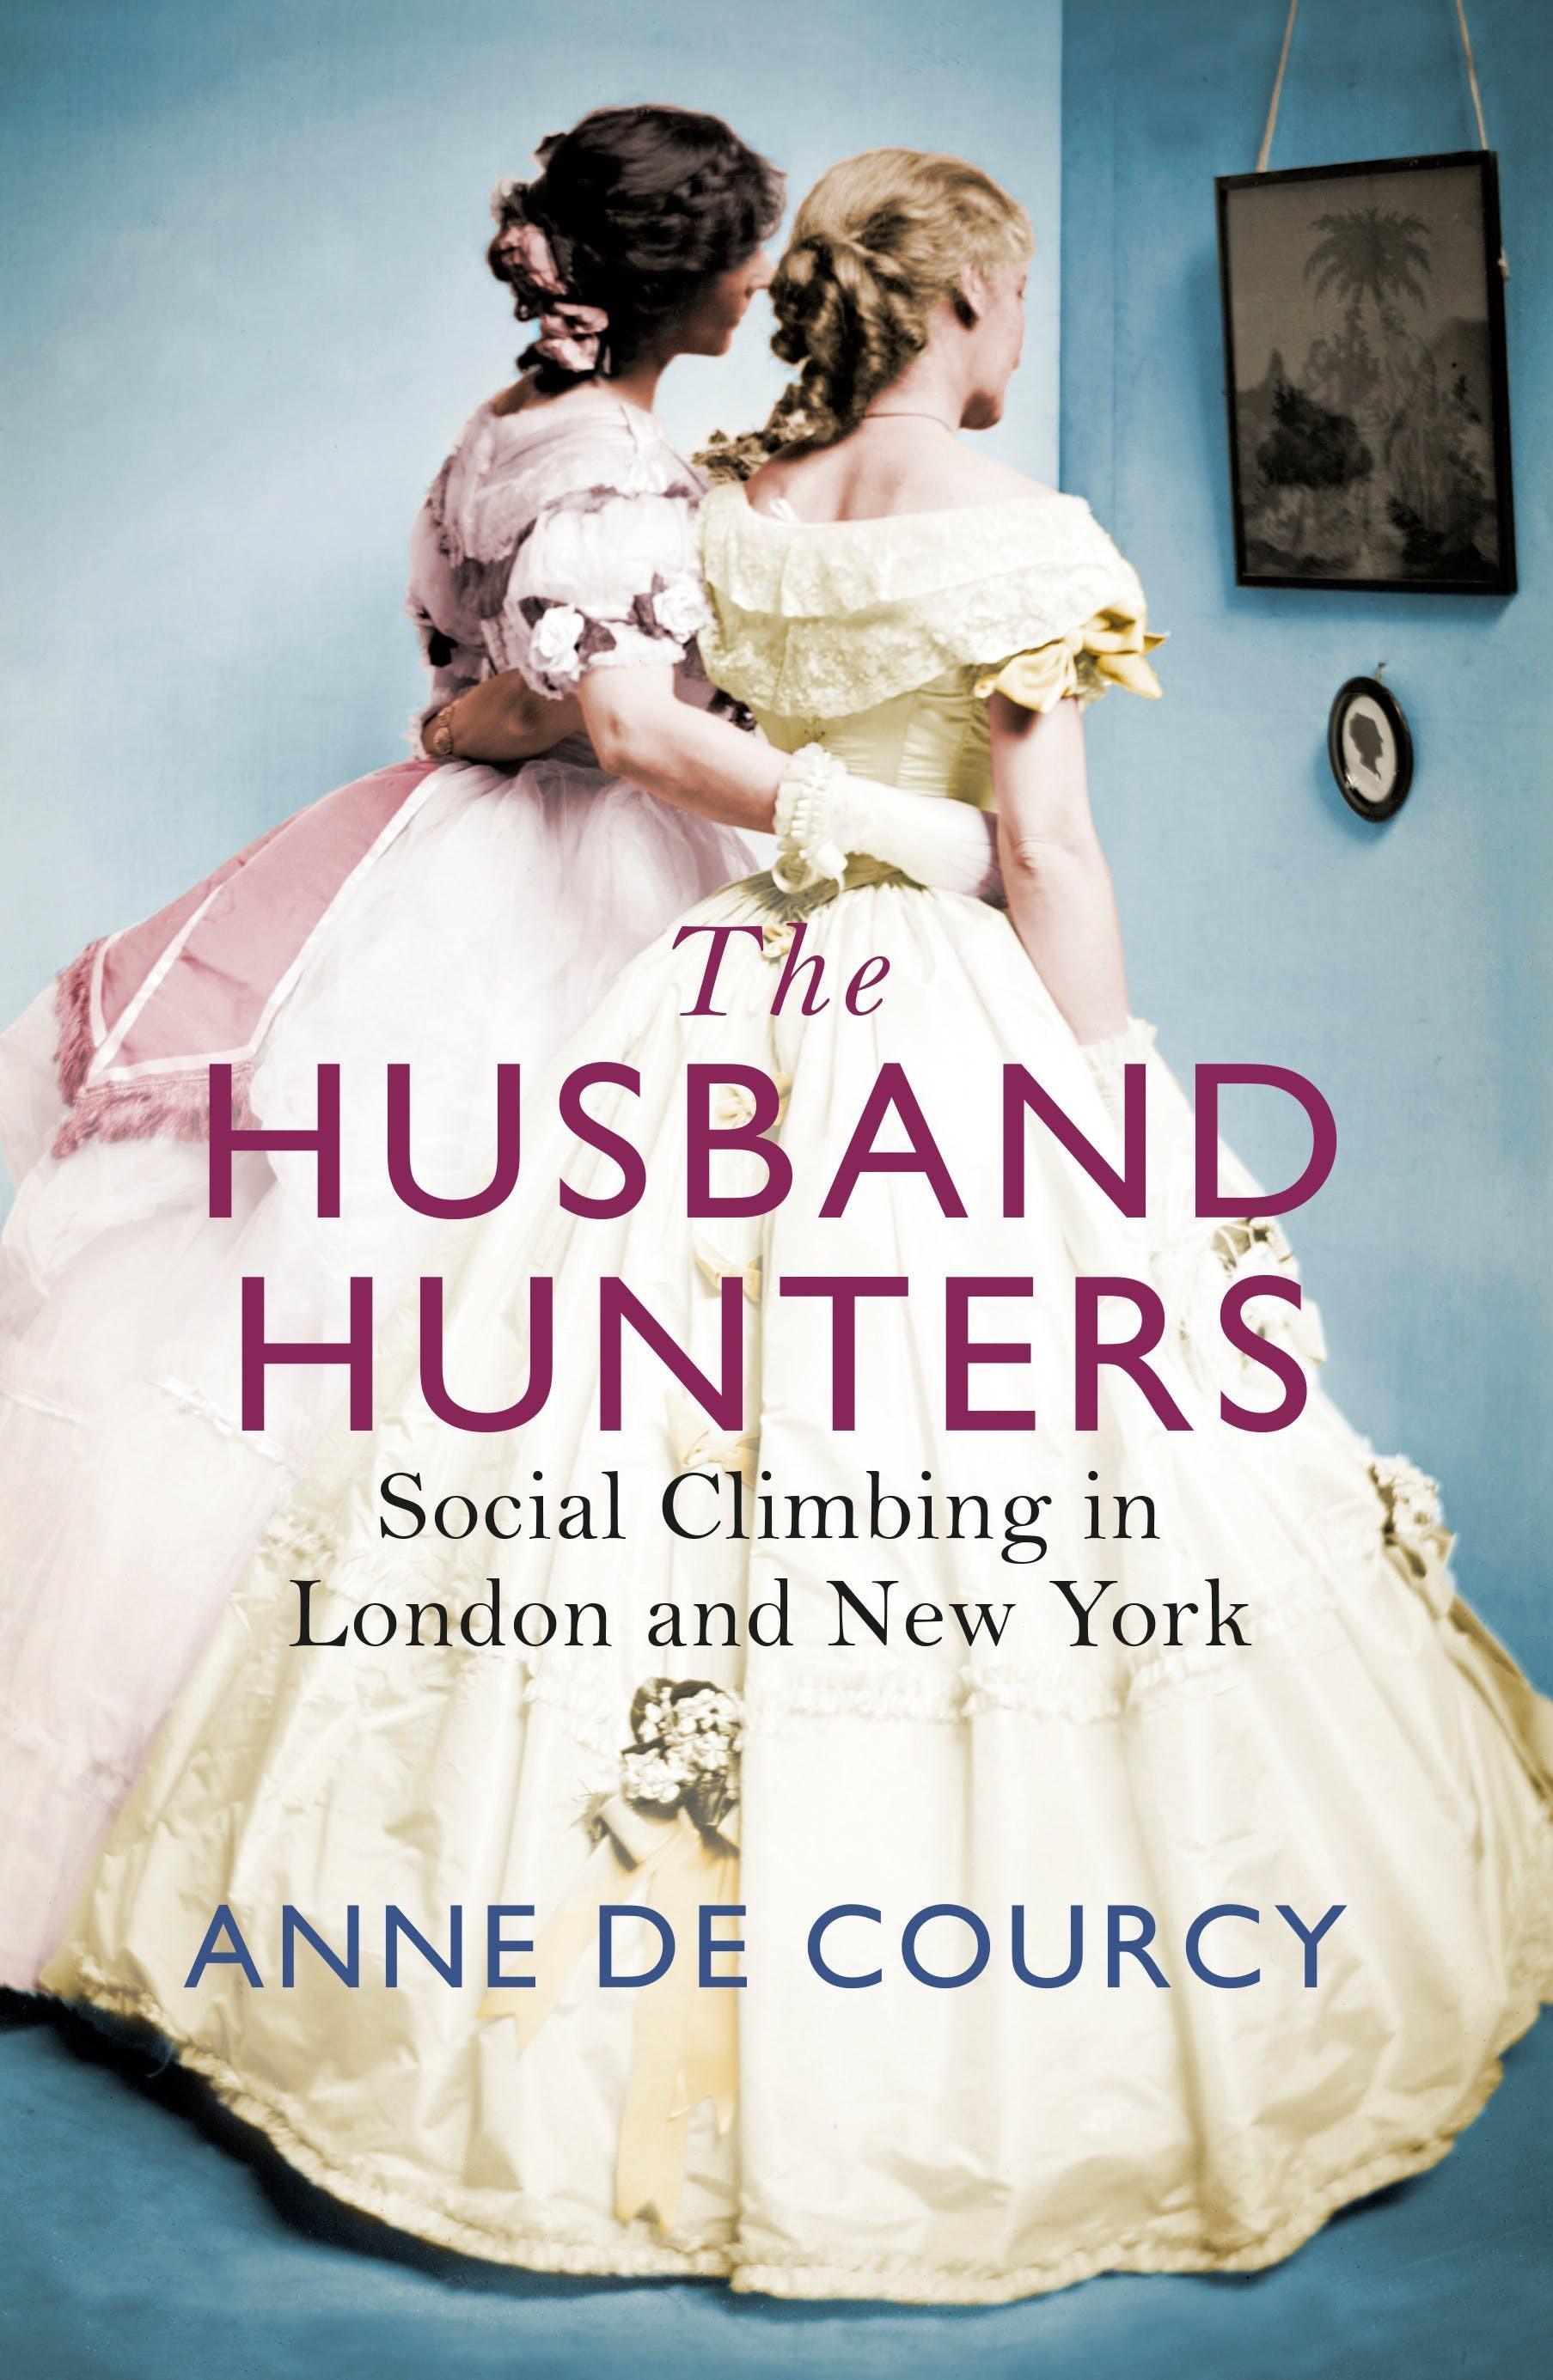 The Husband Hunters: Social Climbing in London andNewYork